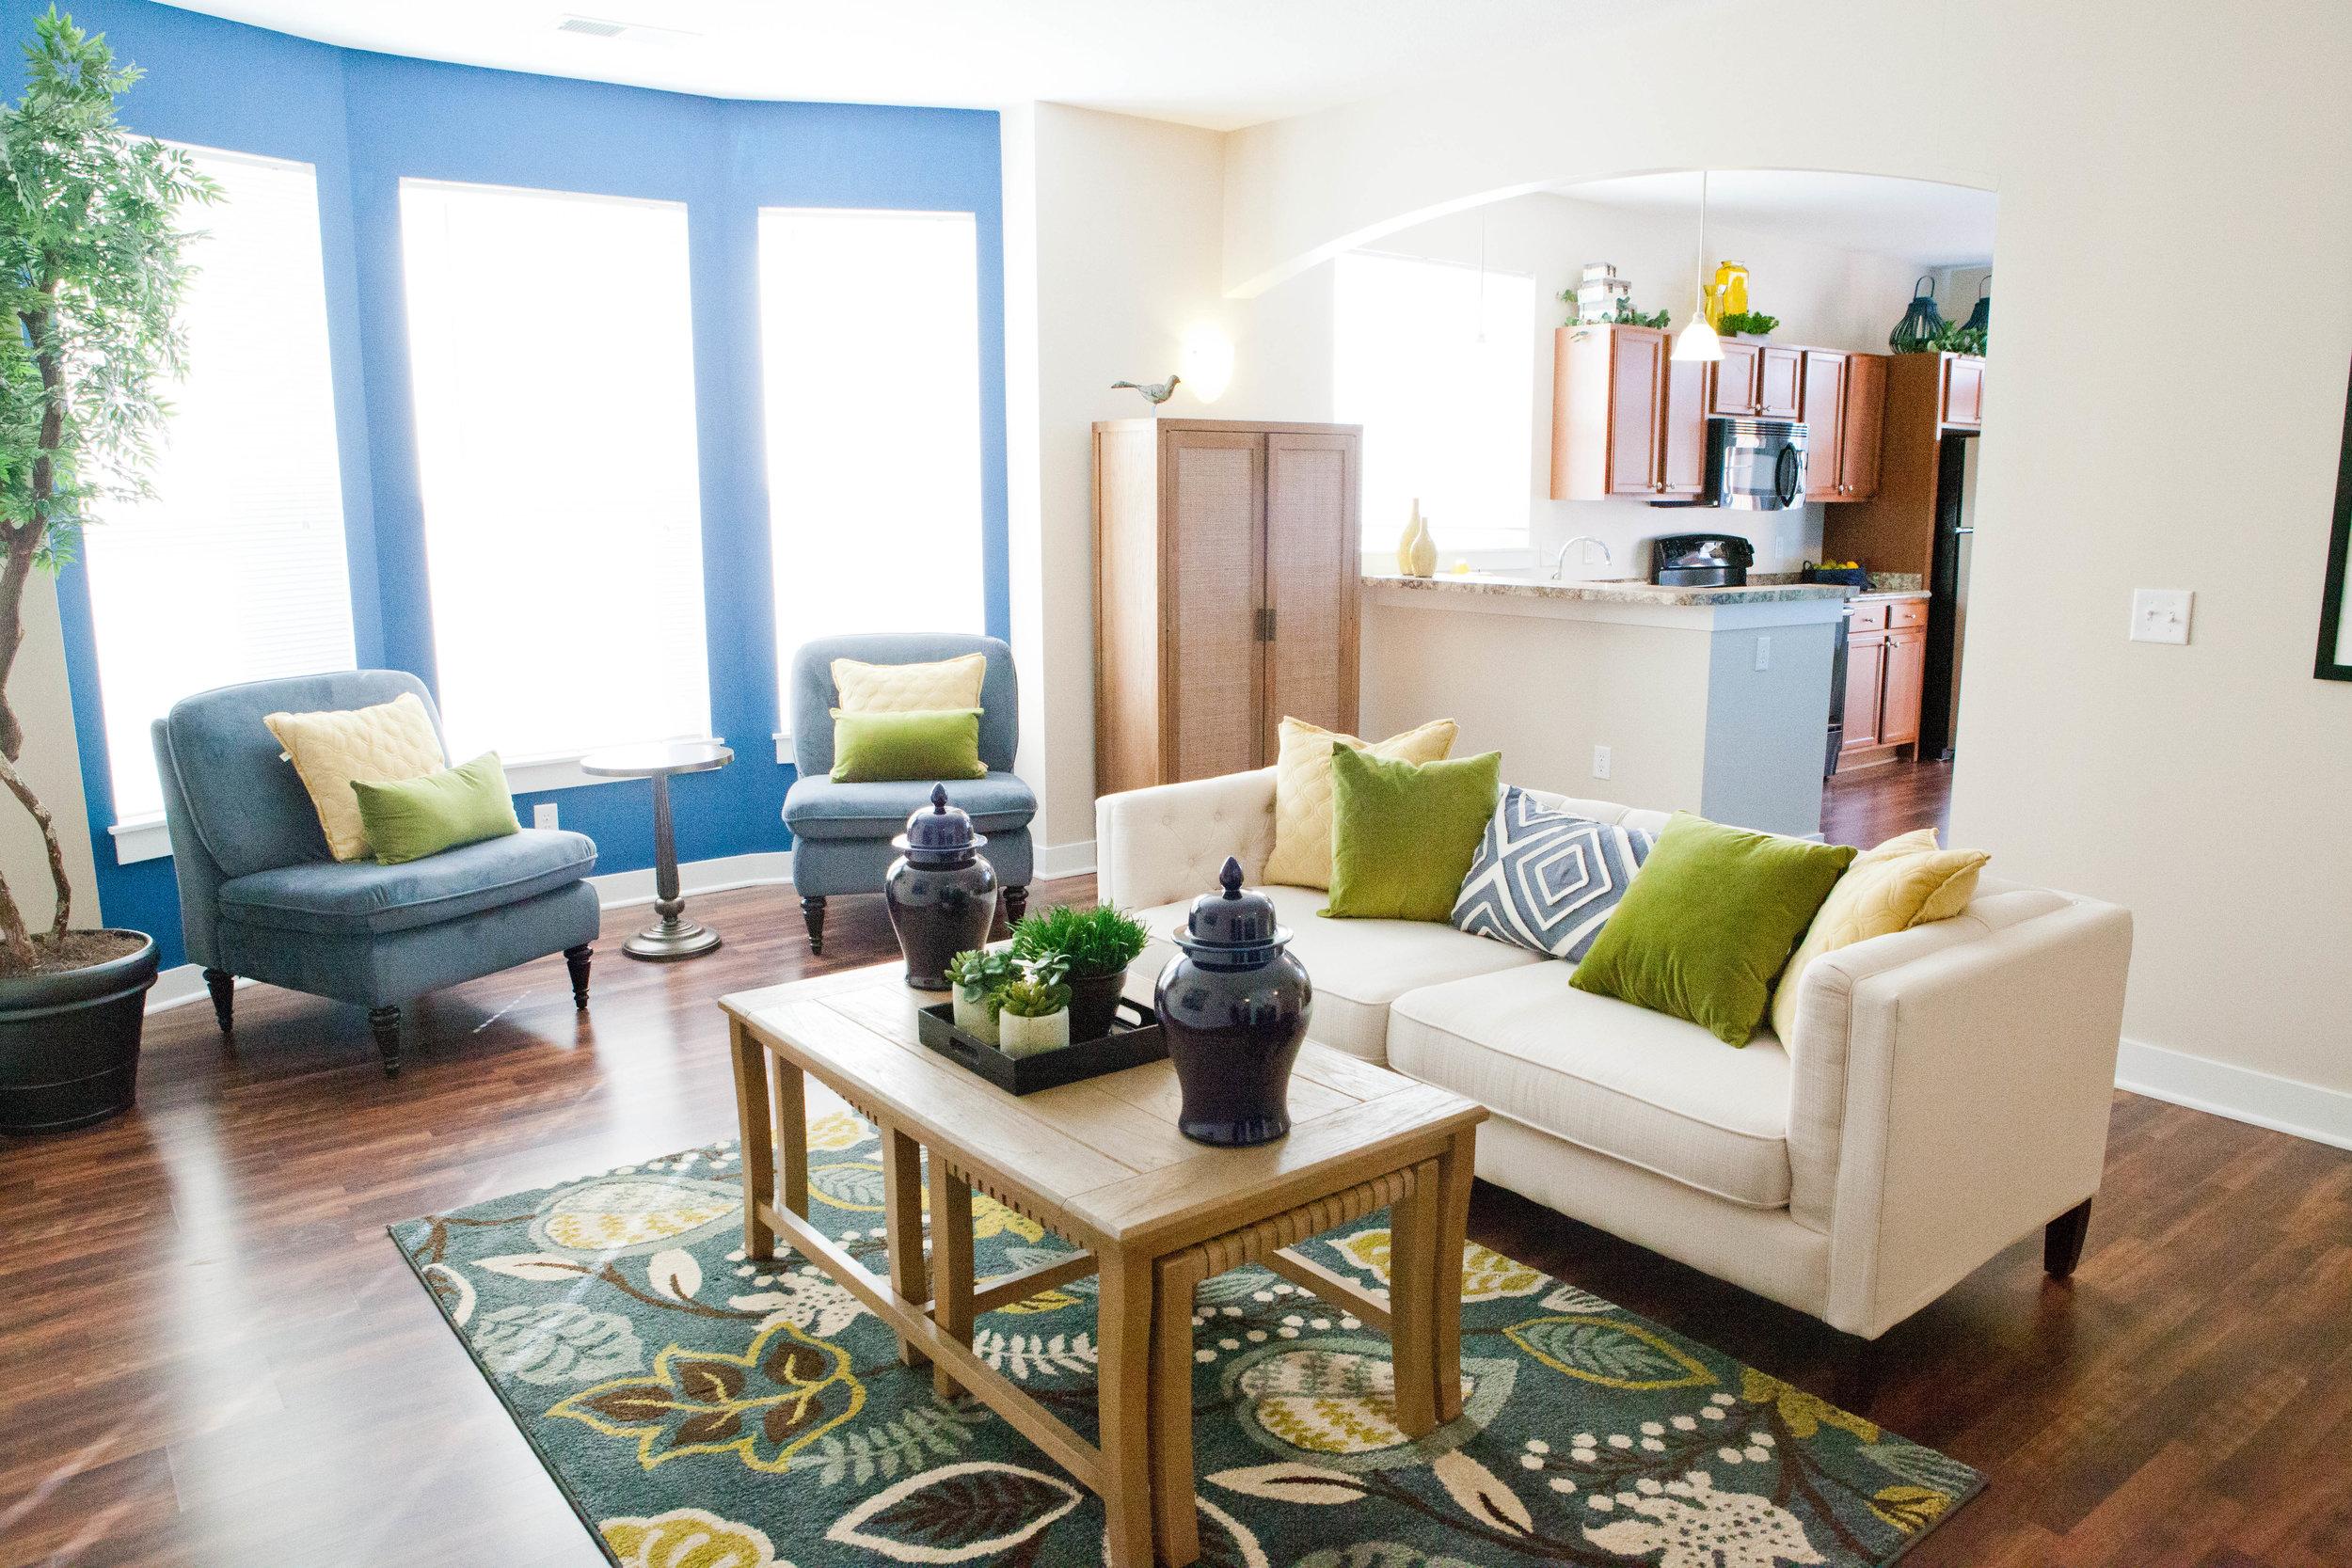 USF - model living room (apartment).JPG